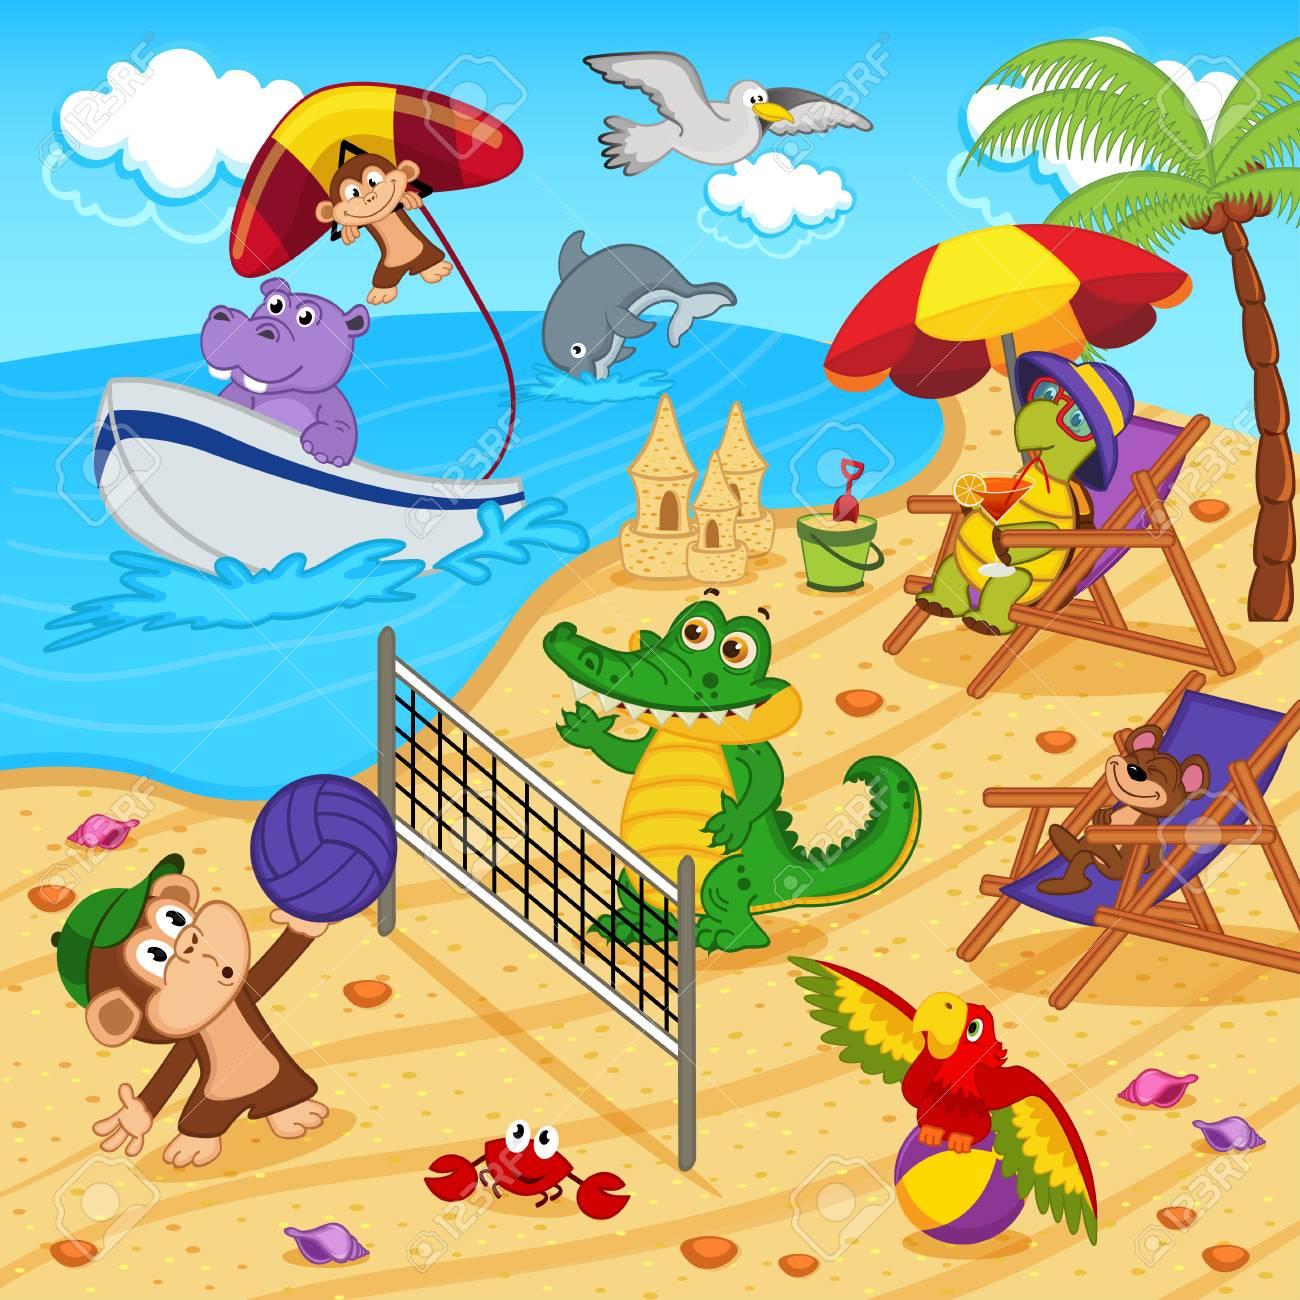 animals resting on beach - vector illustration, eps Standard-Bild - 39172915